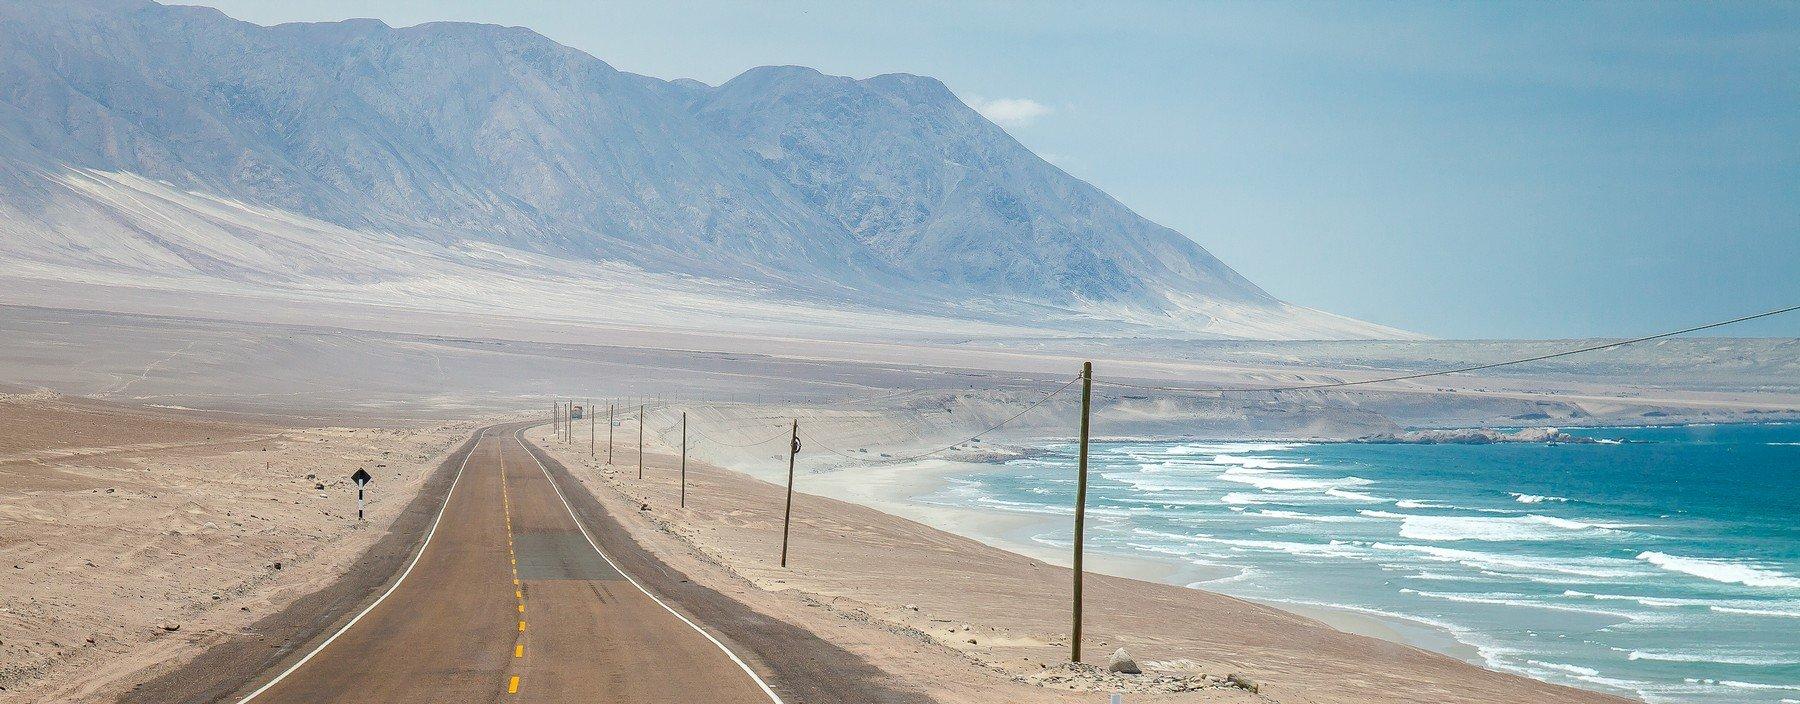 pe, road lima-nazca.jpg